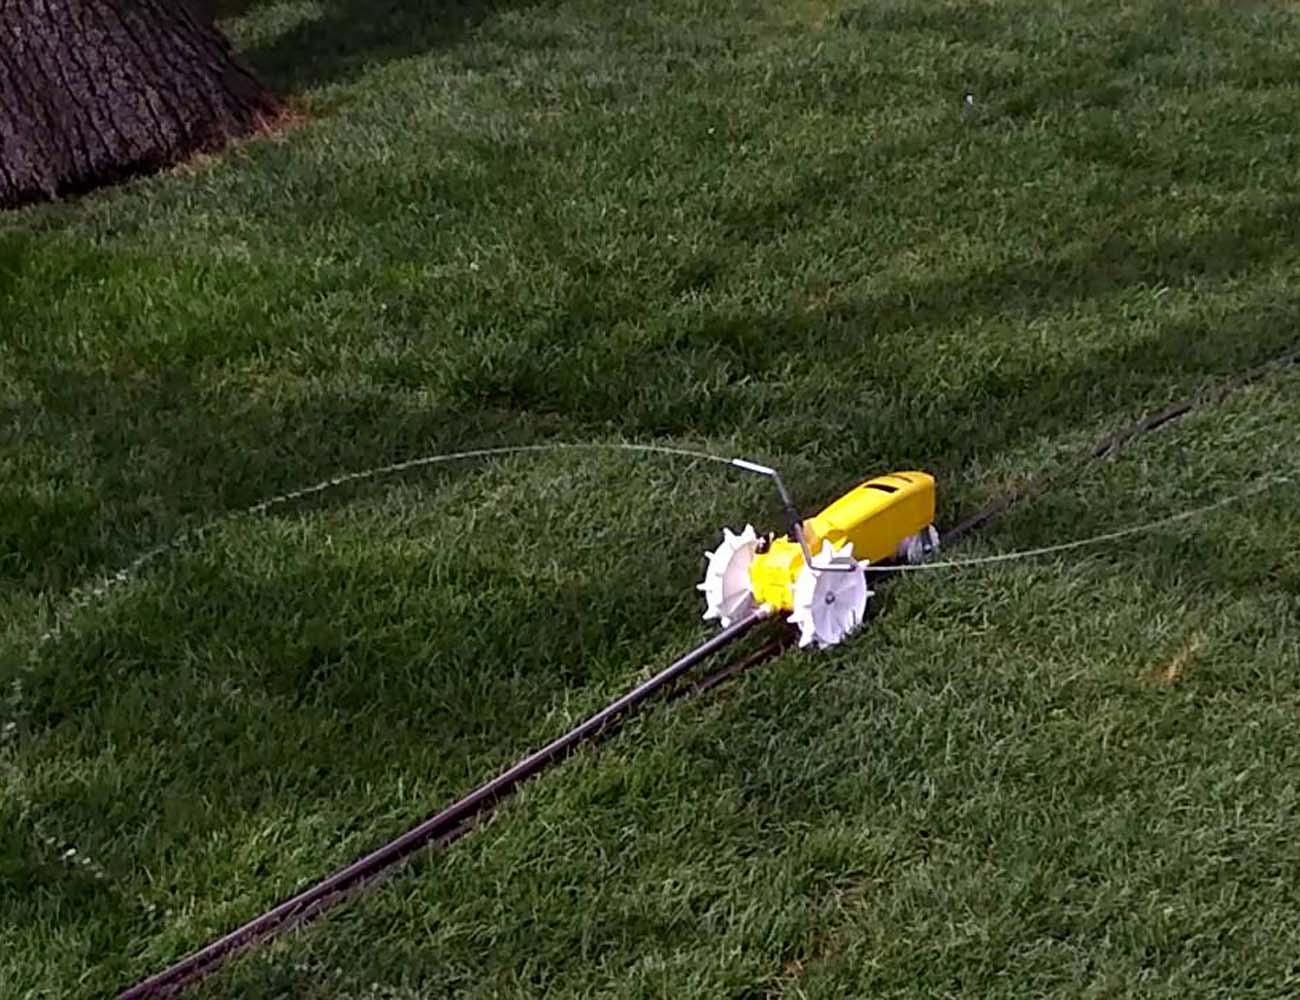 Raintrain+Traveling+Sprinkler+For+Your+Lawn